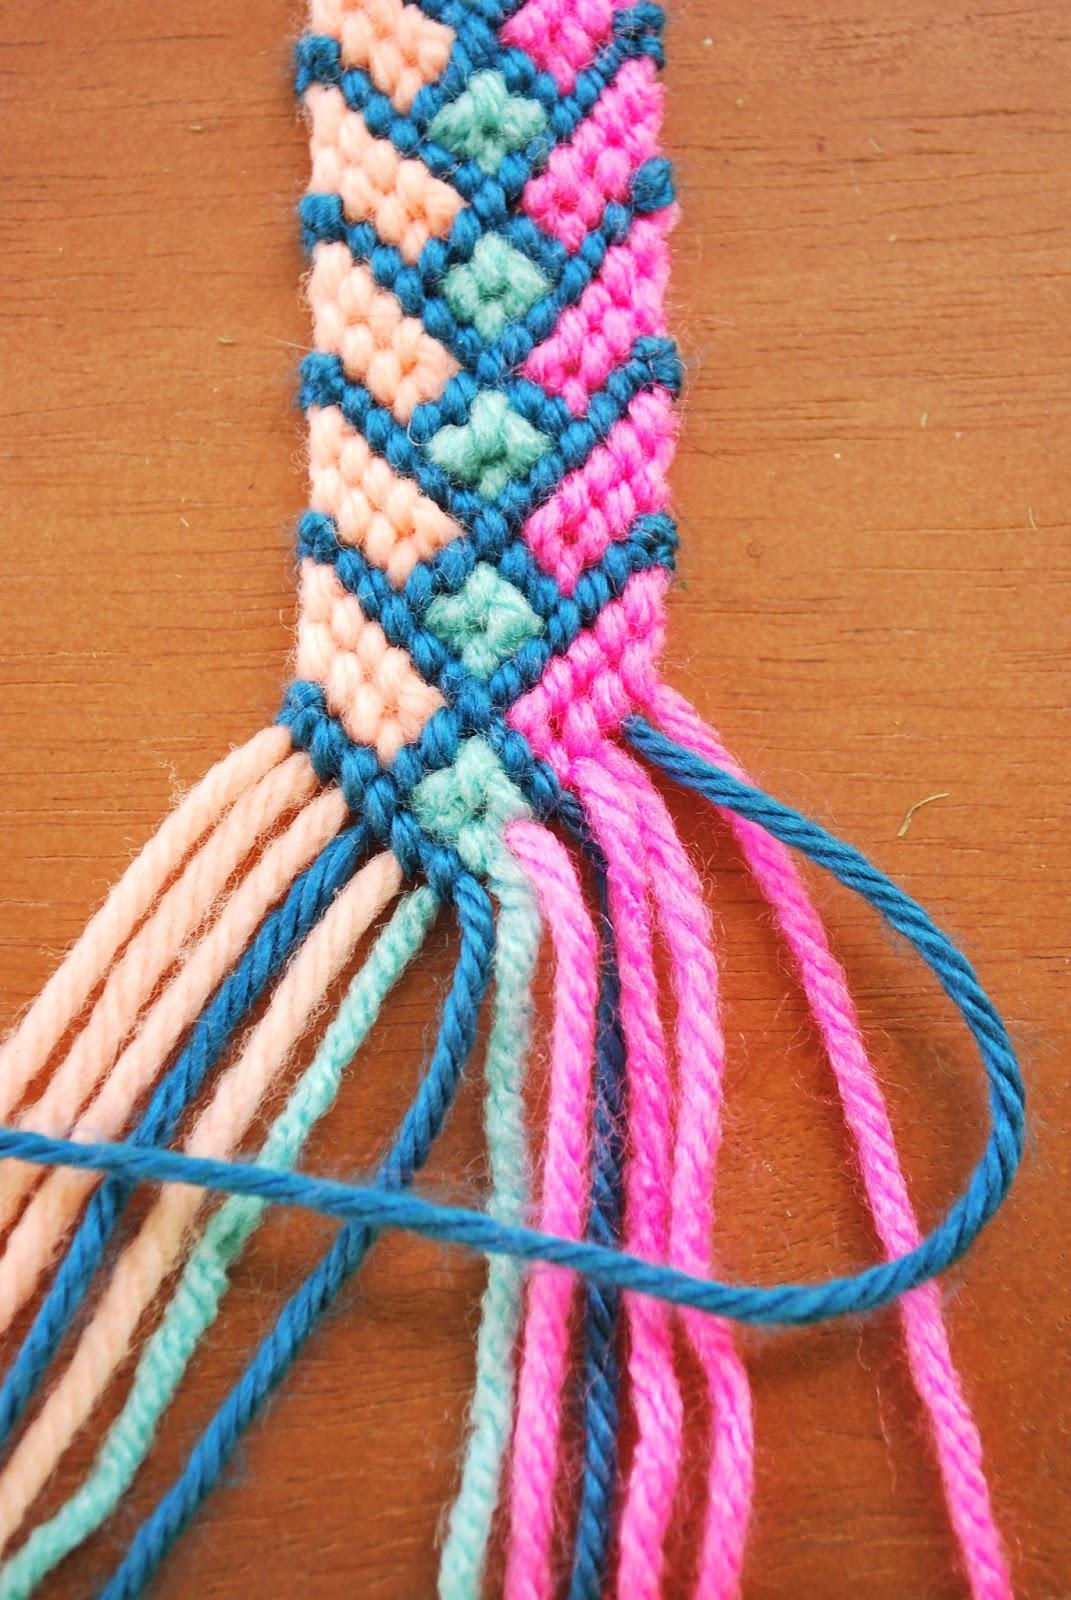 DIY: The Crazy Complicated Friendship Bracelet